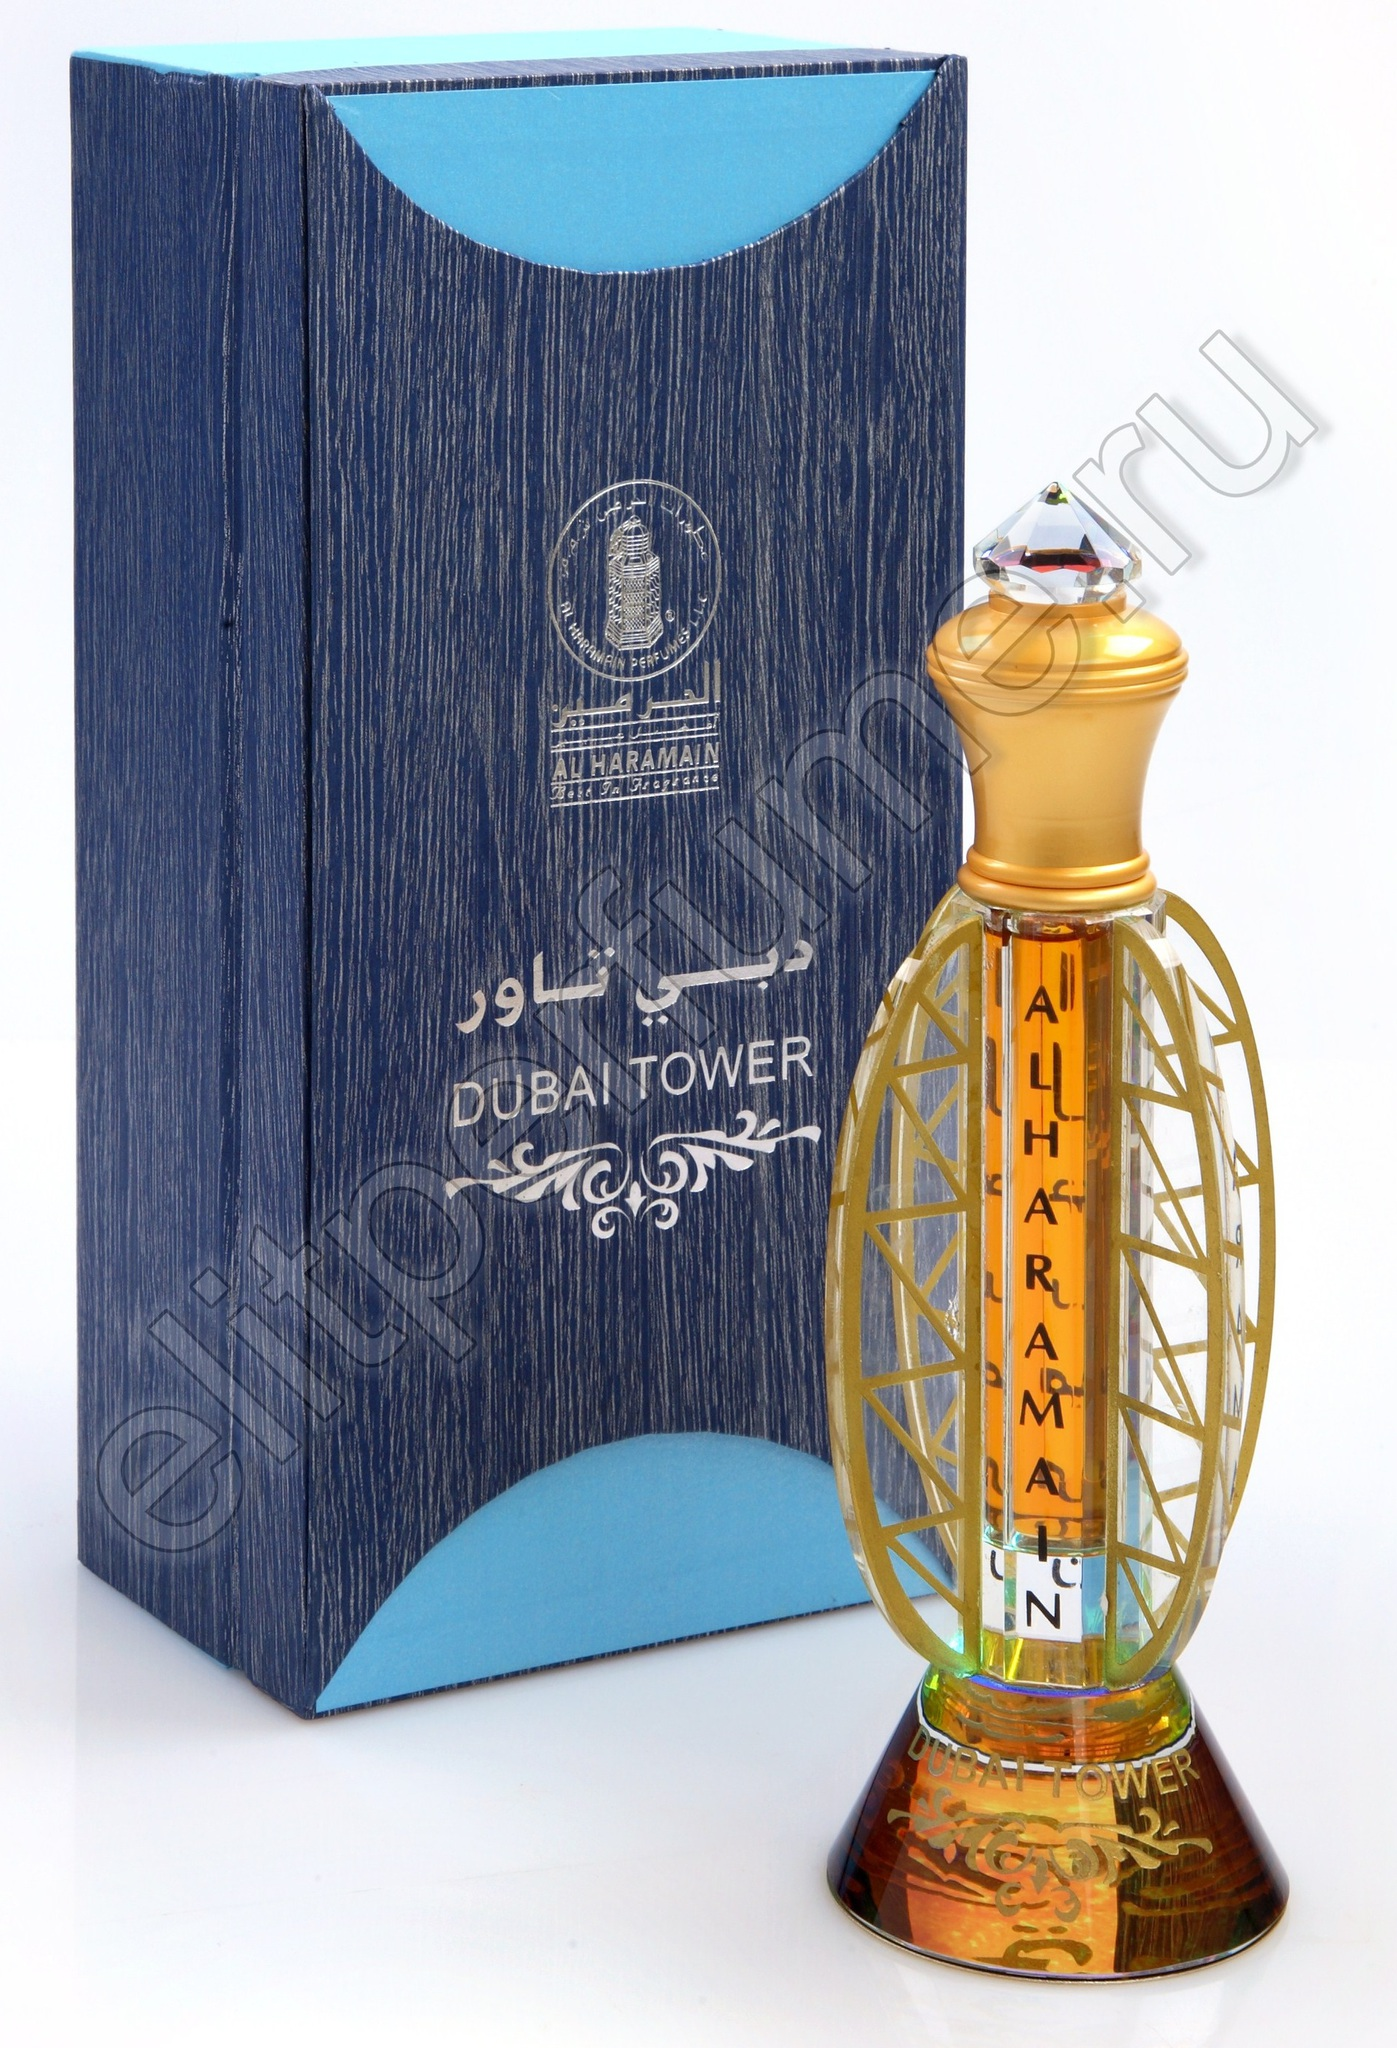 Пробники для духов Башня Дубая Dubai Tower 1 мл арабские масляные духи от Аль Харамайн Al Haramin Perfumes